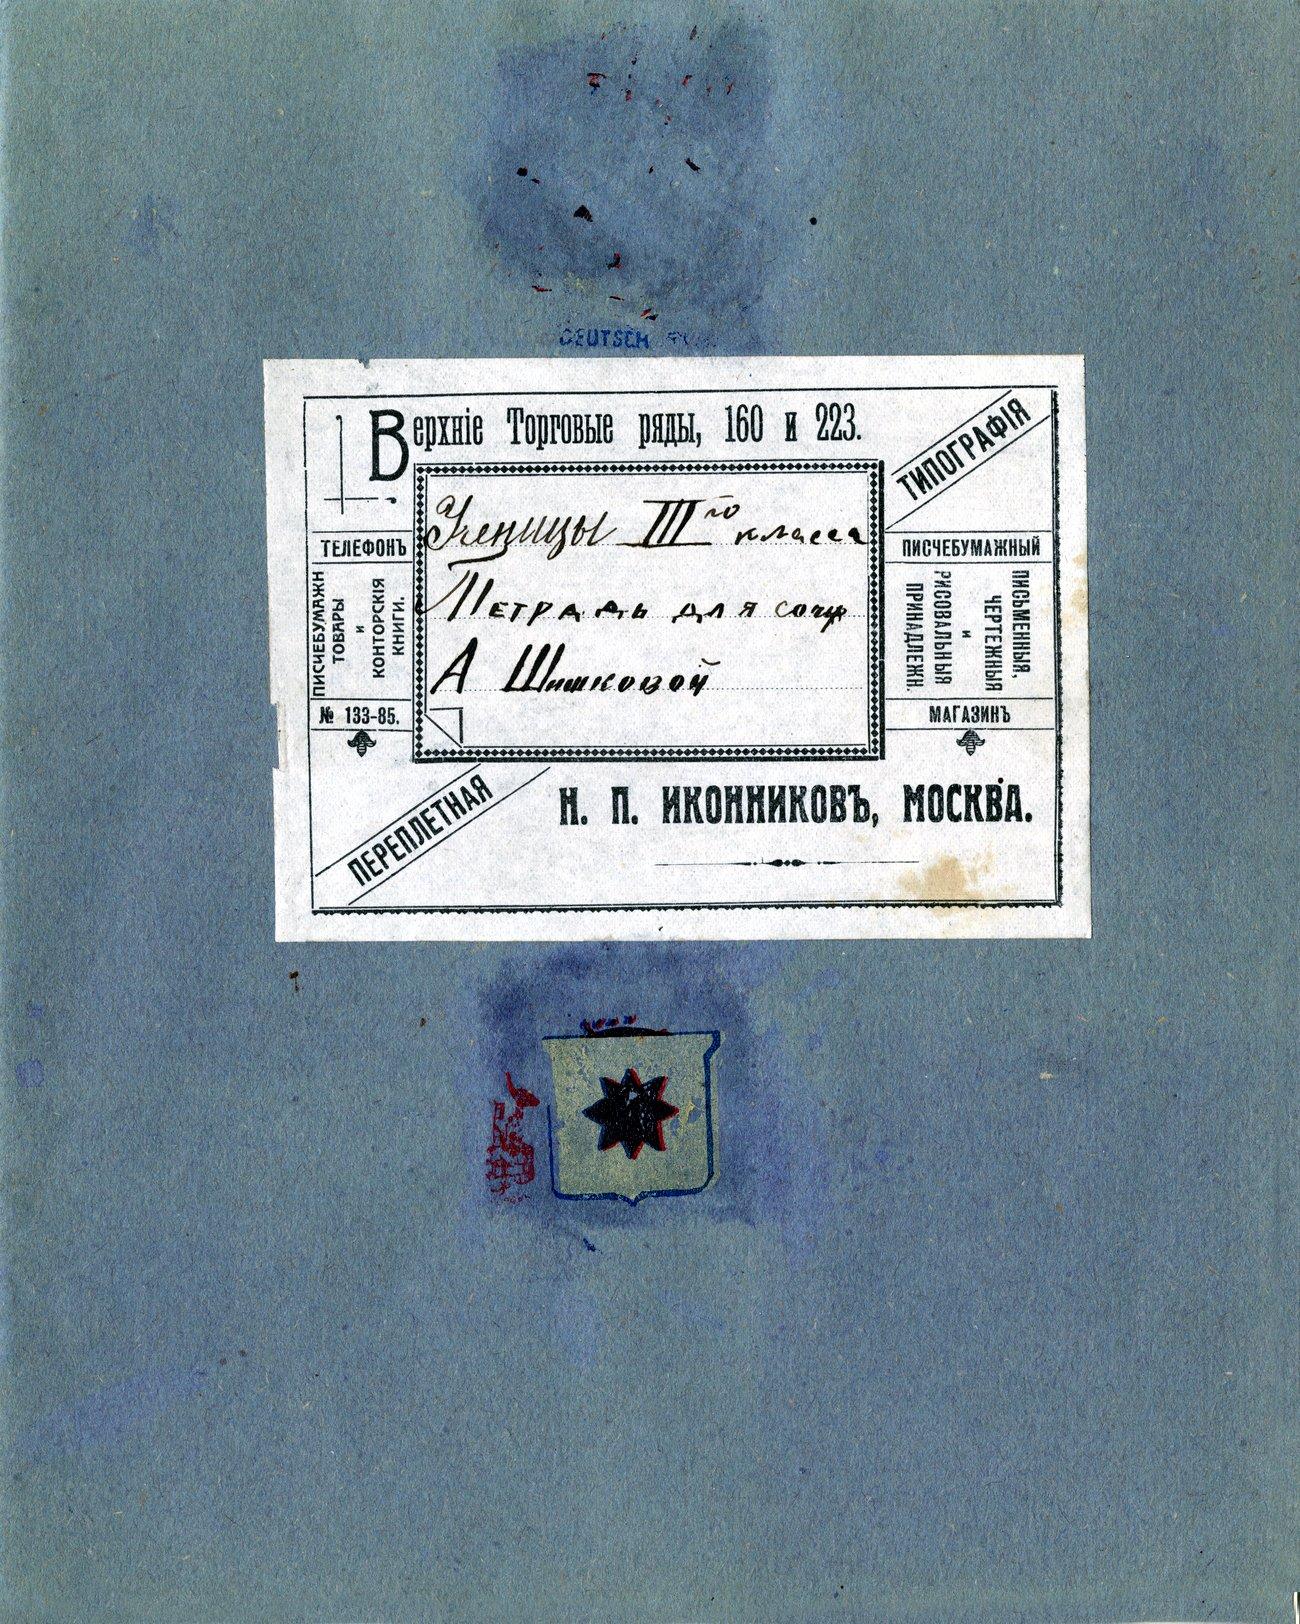 Тетрадь Иконников, Москва, 180х220